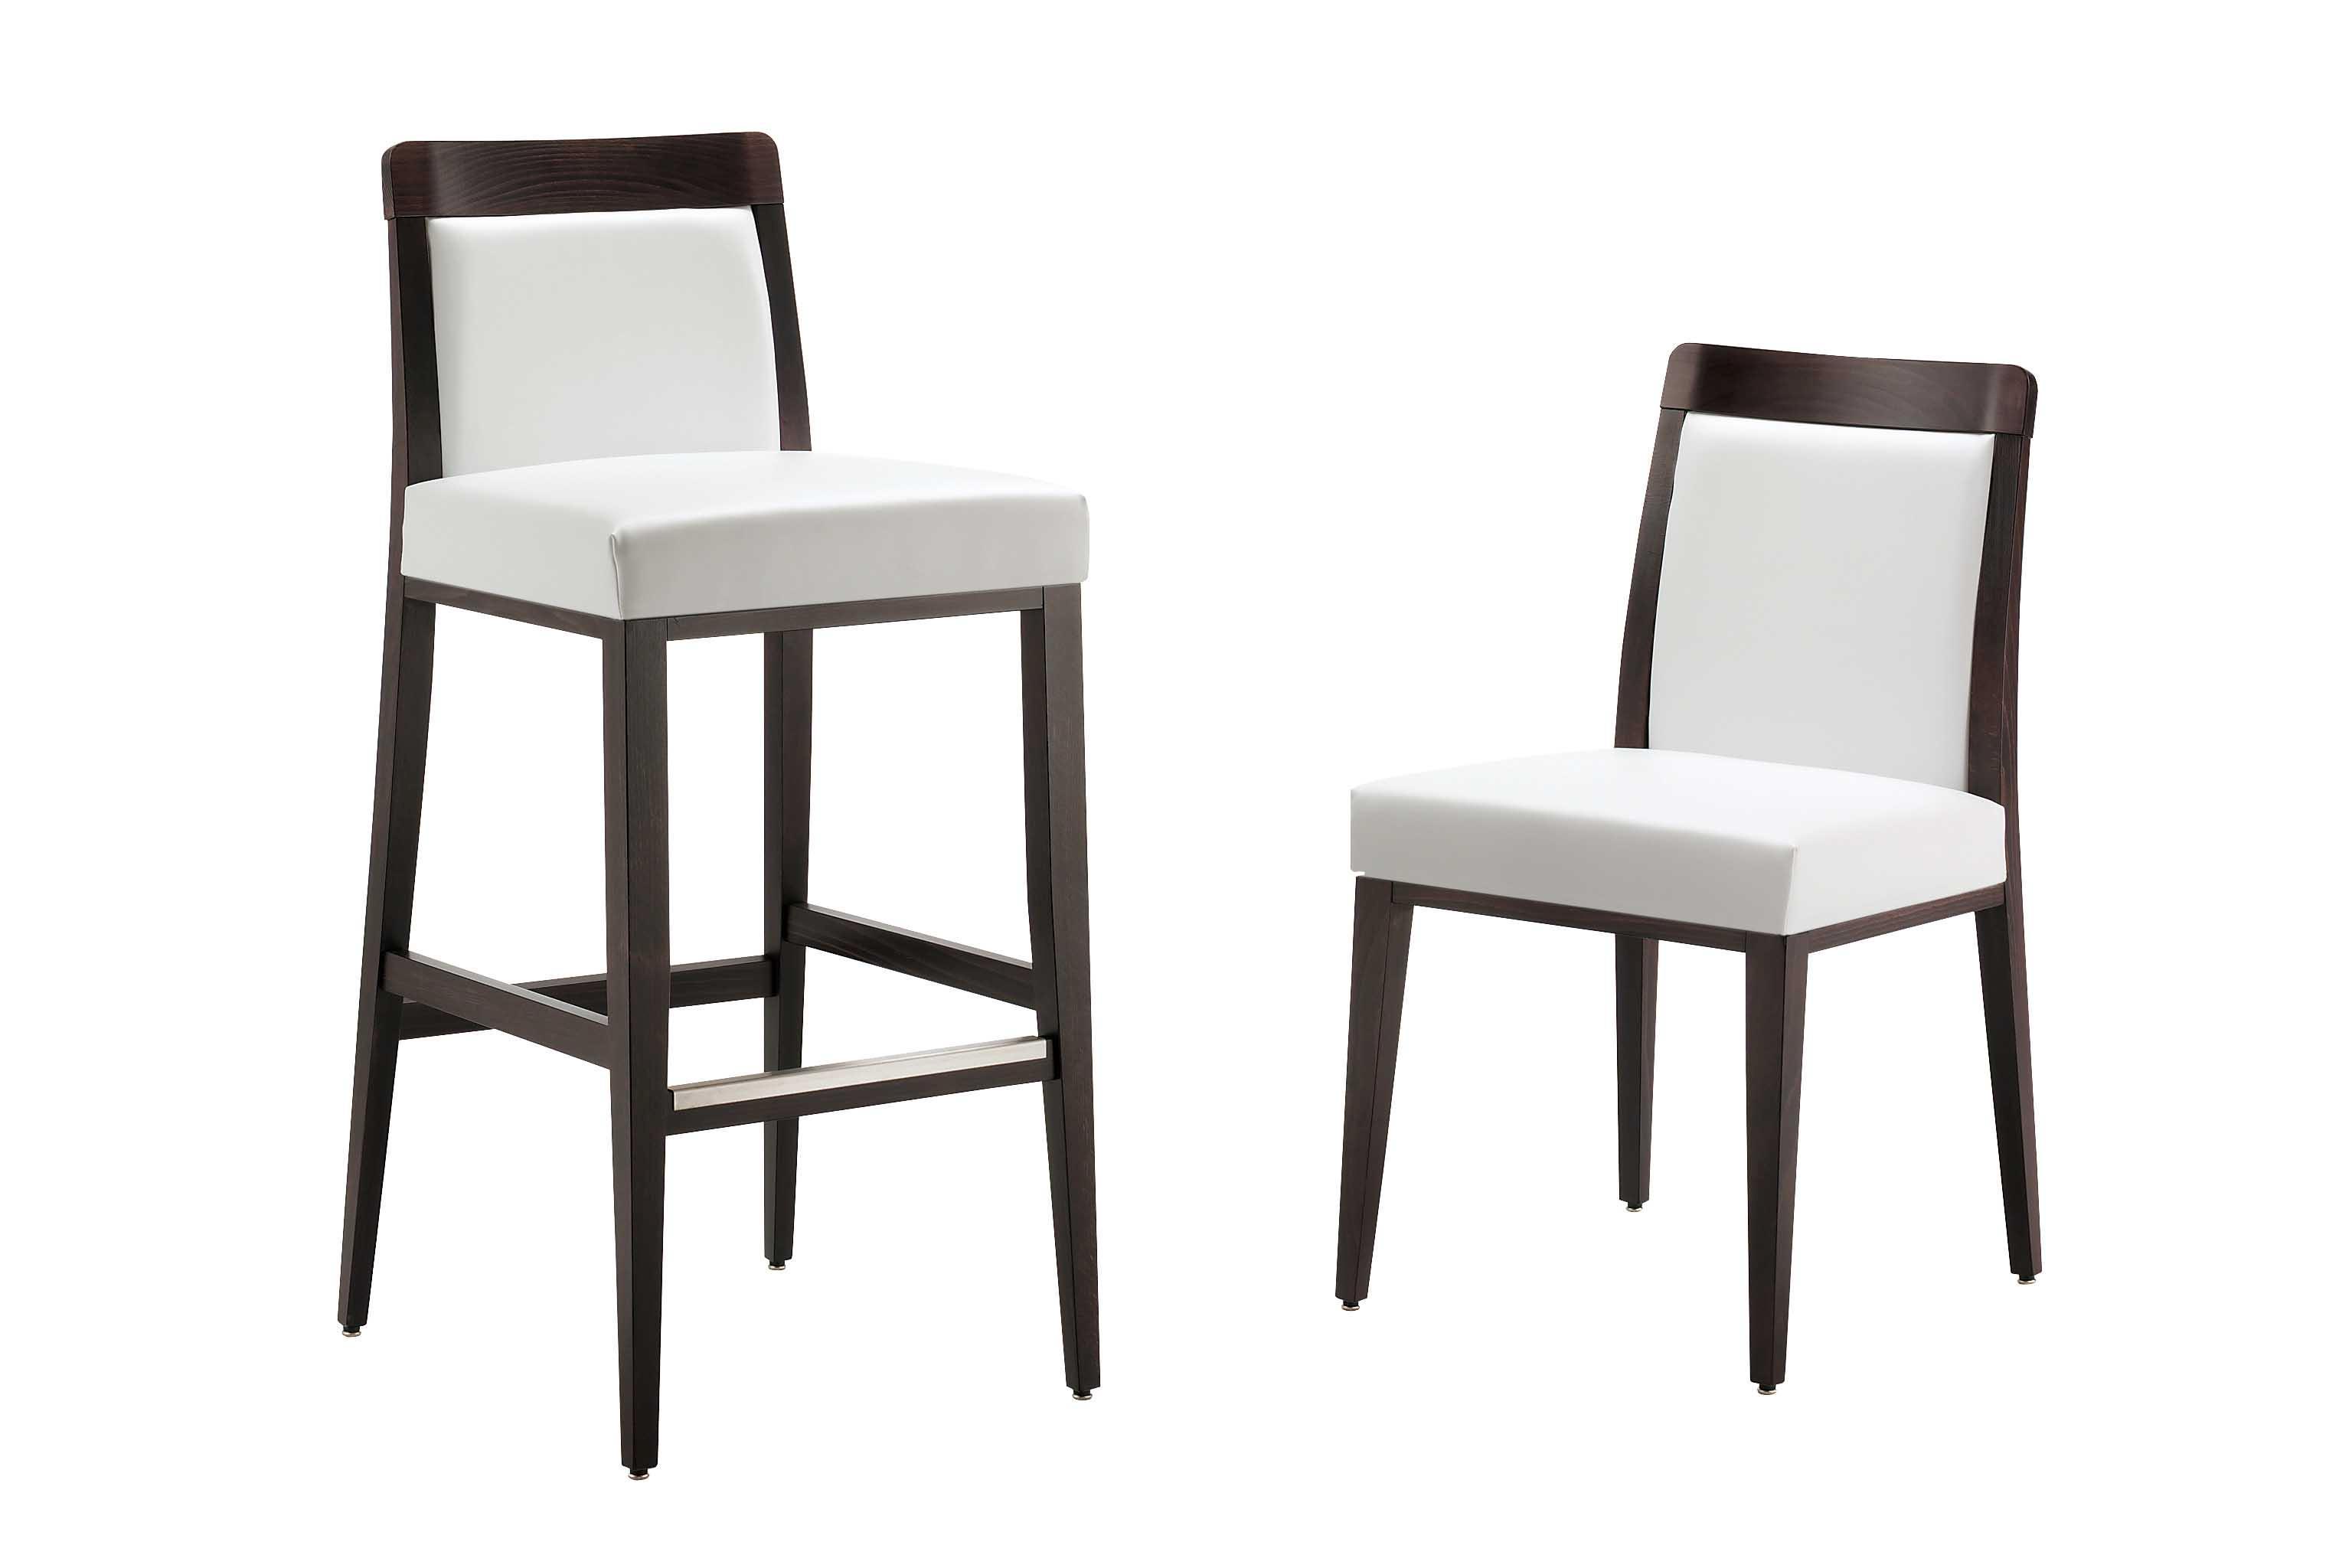 Modern Restaurant Chairs Unique Modern Restaurant Chairs For Home  Design Ideas With Modern